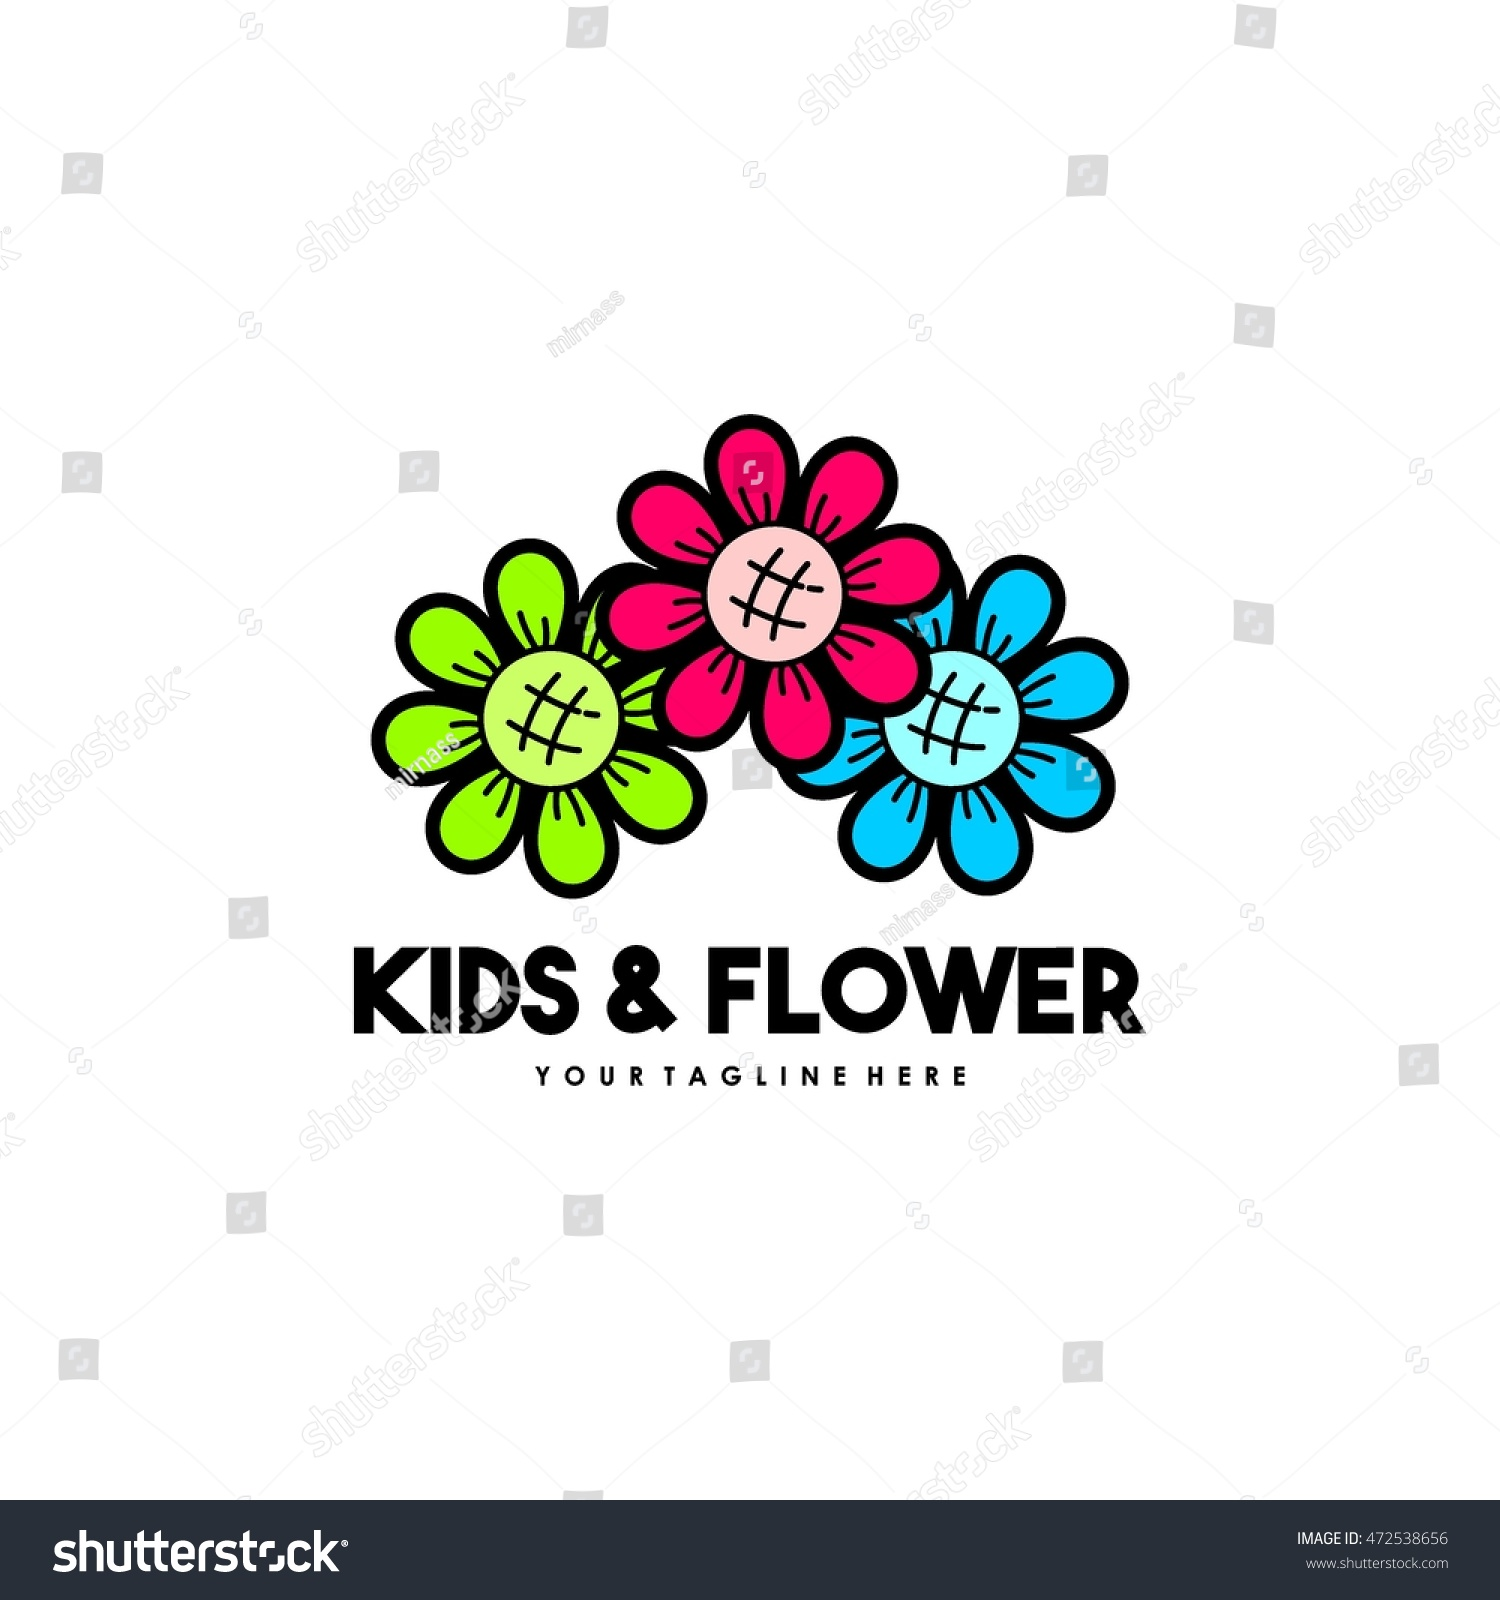 Playgroup Preschool Kindergarten Logo Template